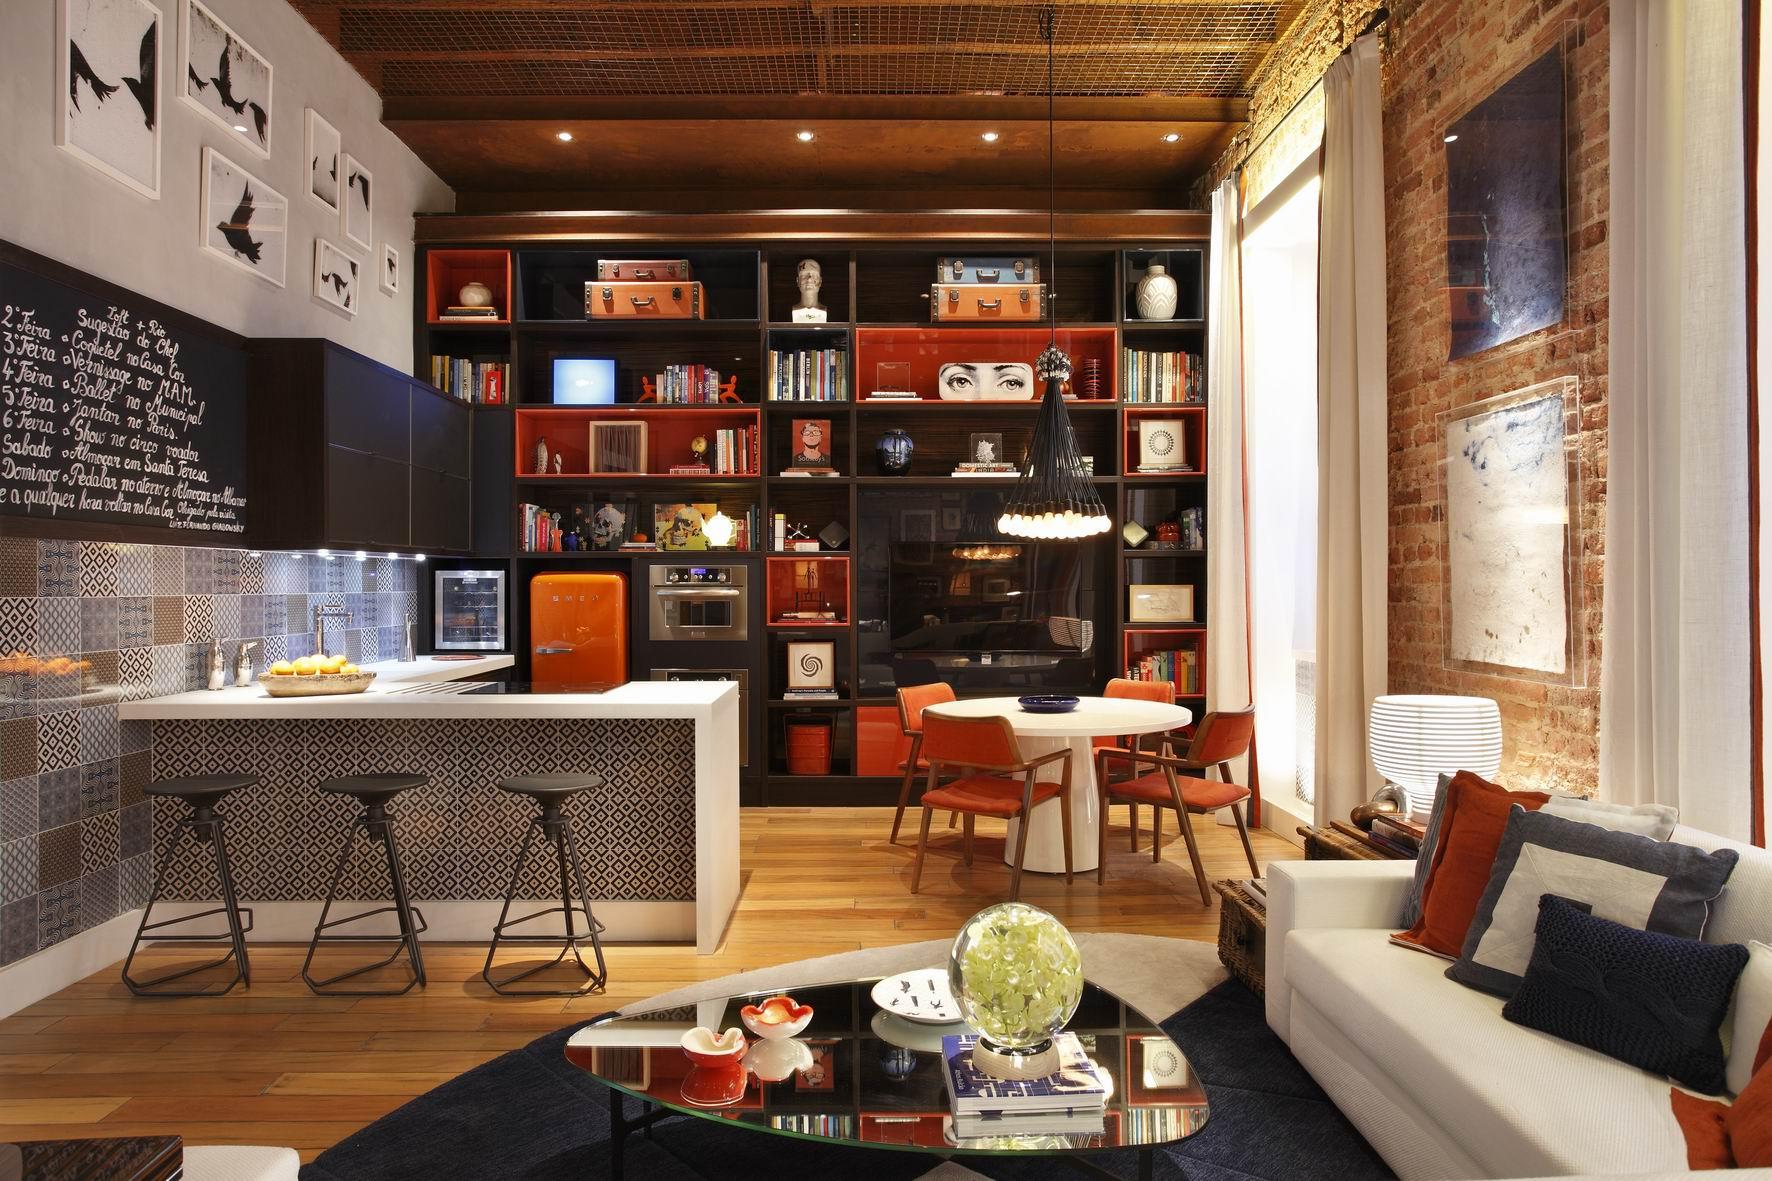 loft home design zagreb - Loft Home Design